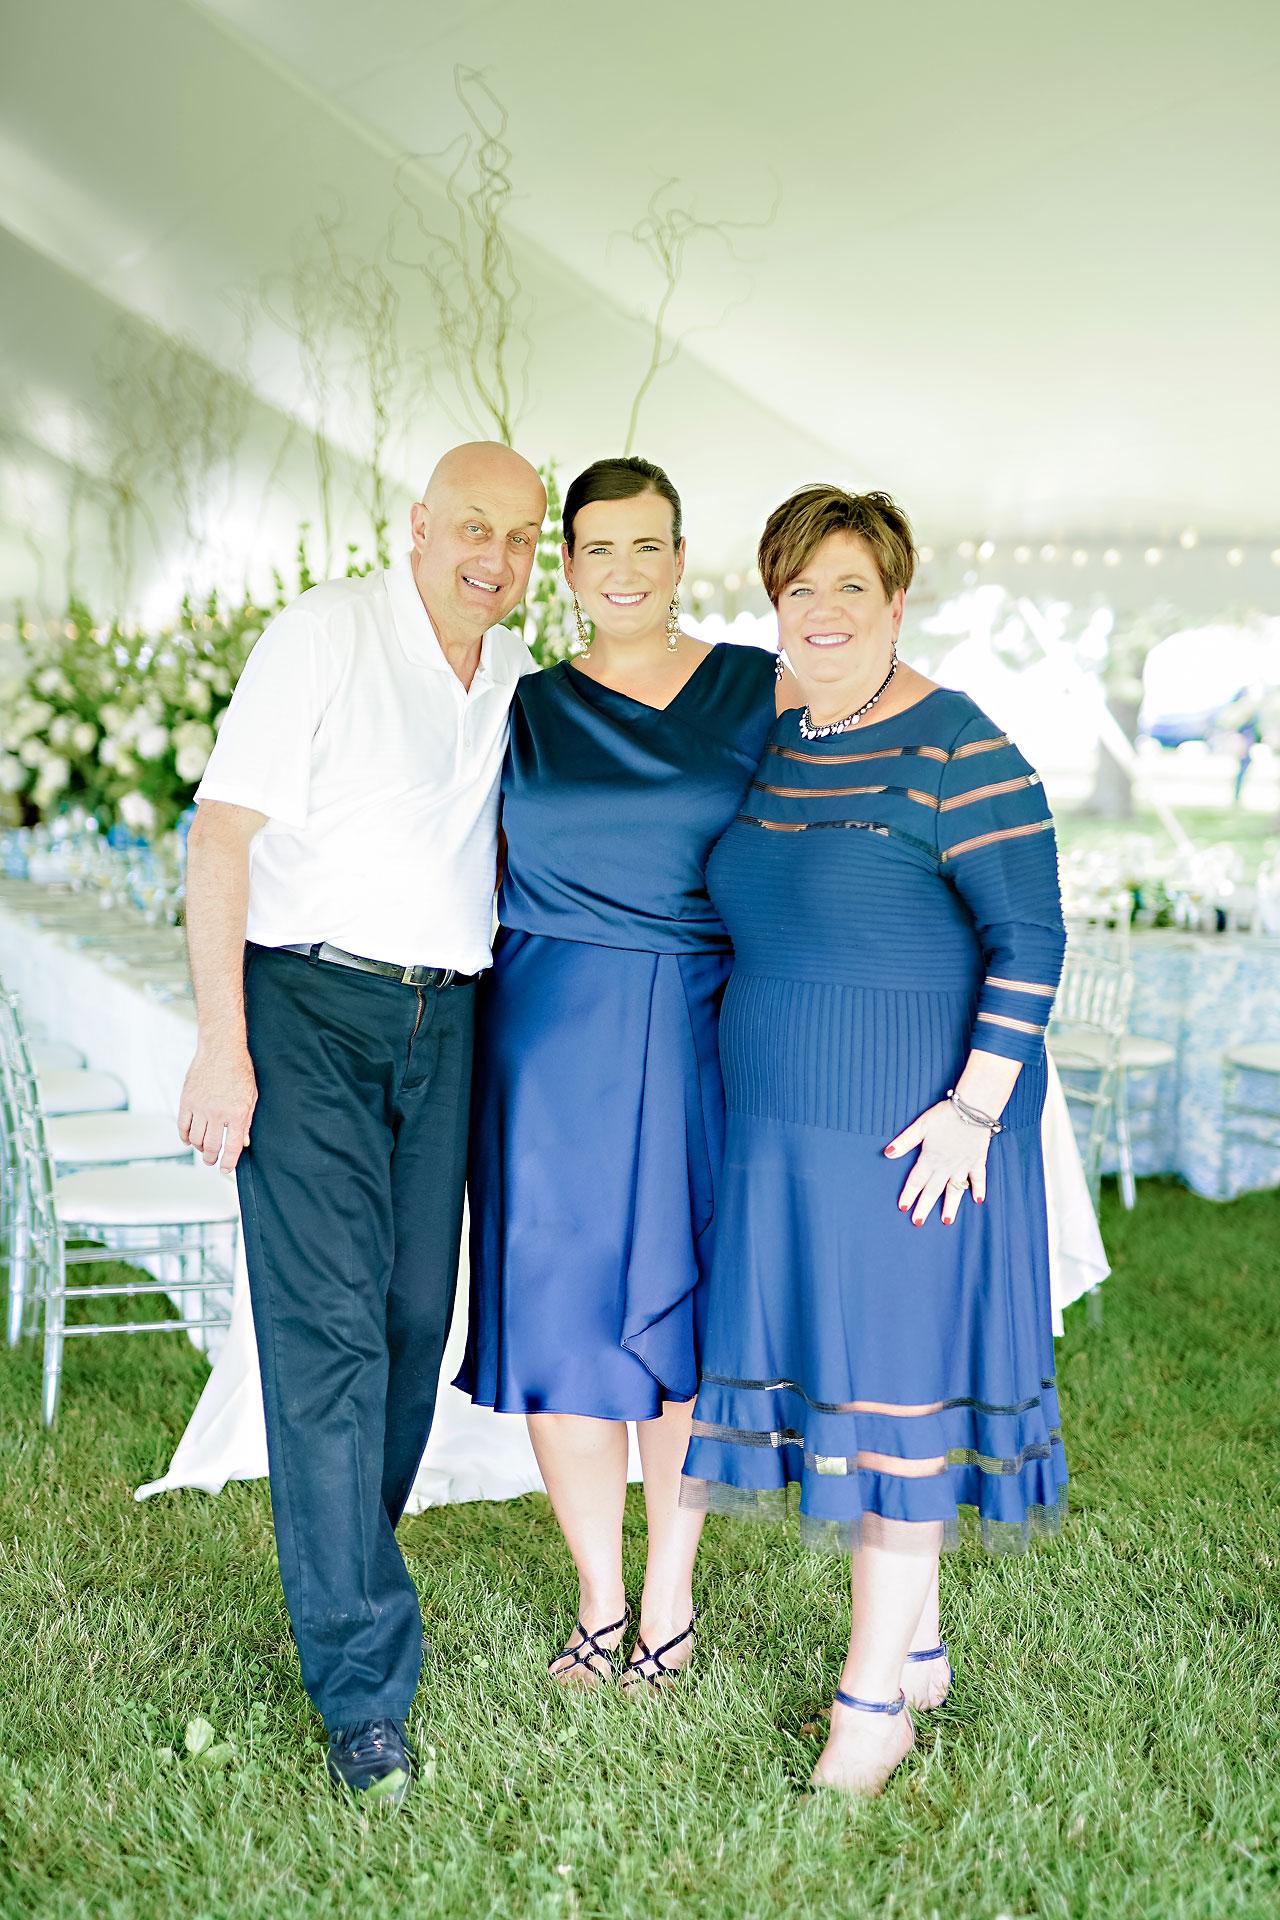 MacKinze John Lafayette Indiana Purdue Wedding 200